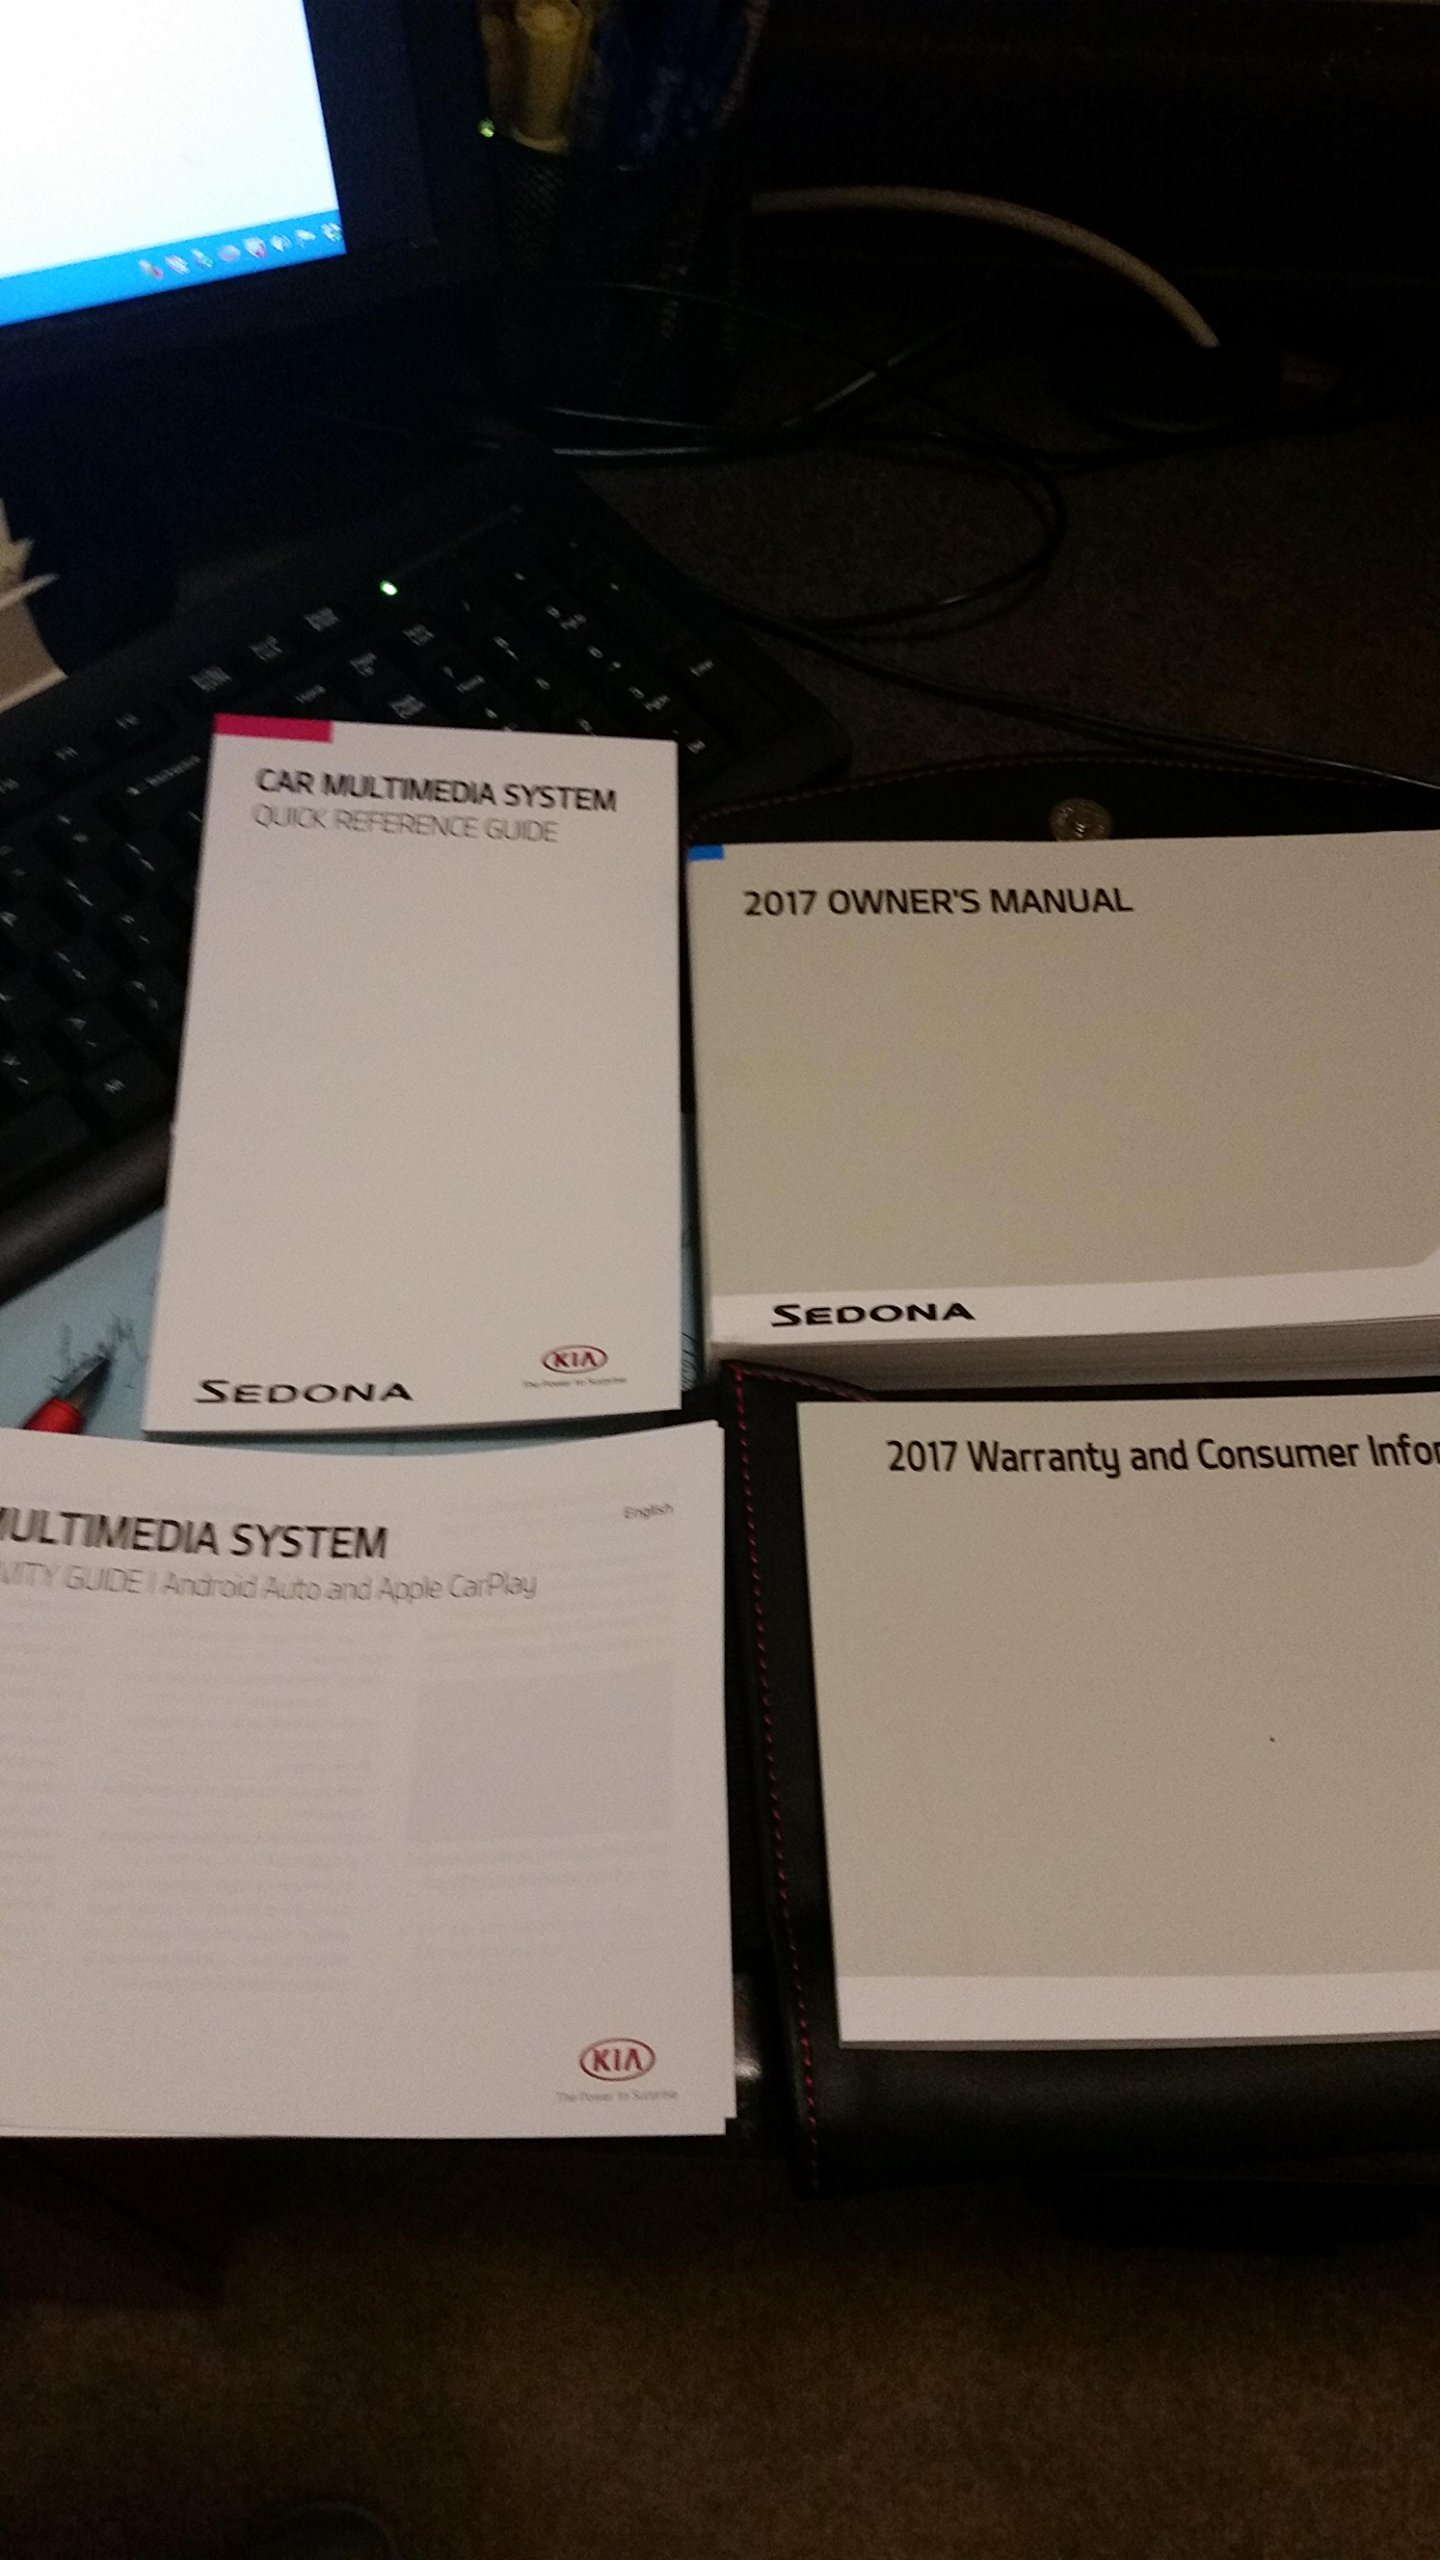 2017 kia sedona owners manual guidebook amazon com books rh amazon com kia sedona owners manual kia sedona owners manual 2016